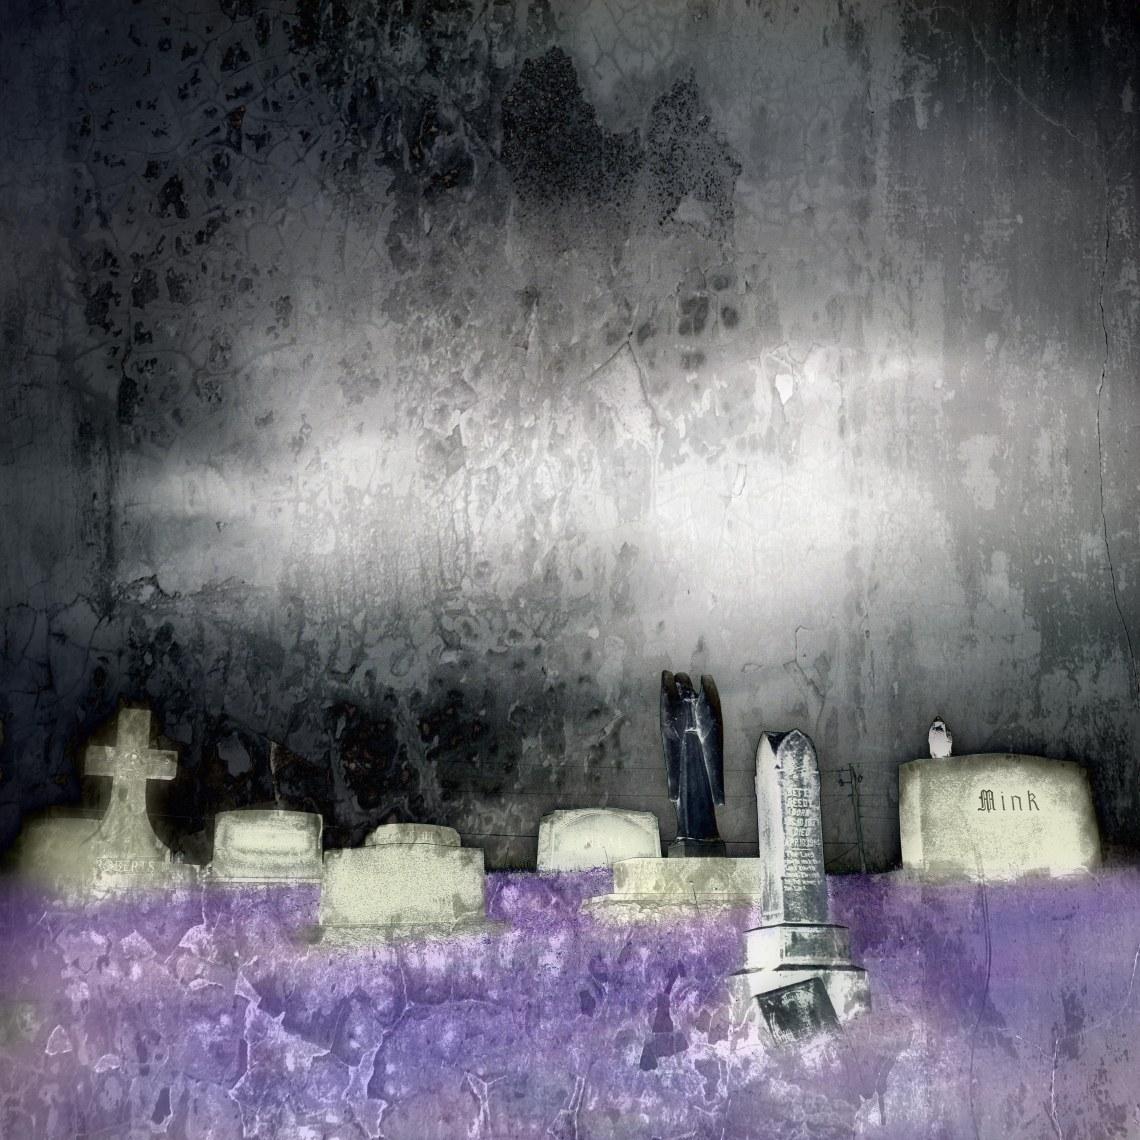 grave virginia 1 overlay w blur desat 1 copy.jpg 3